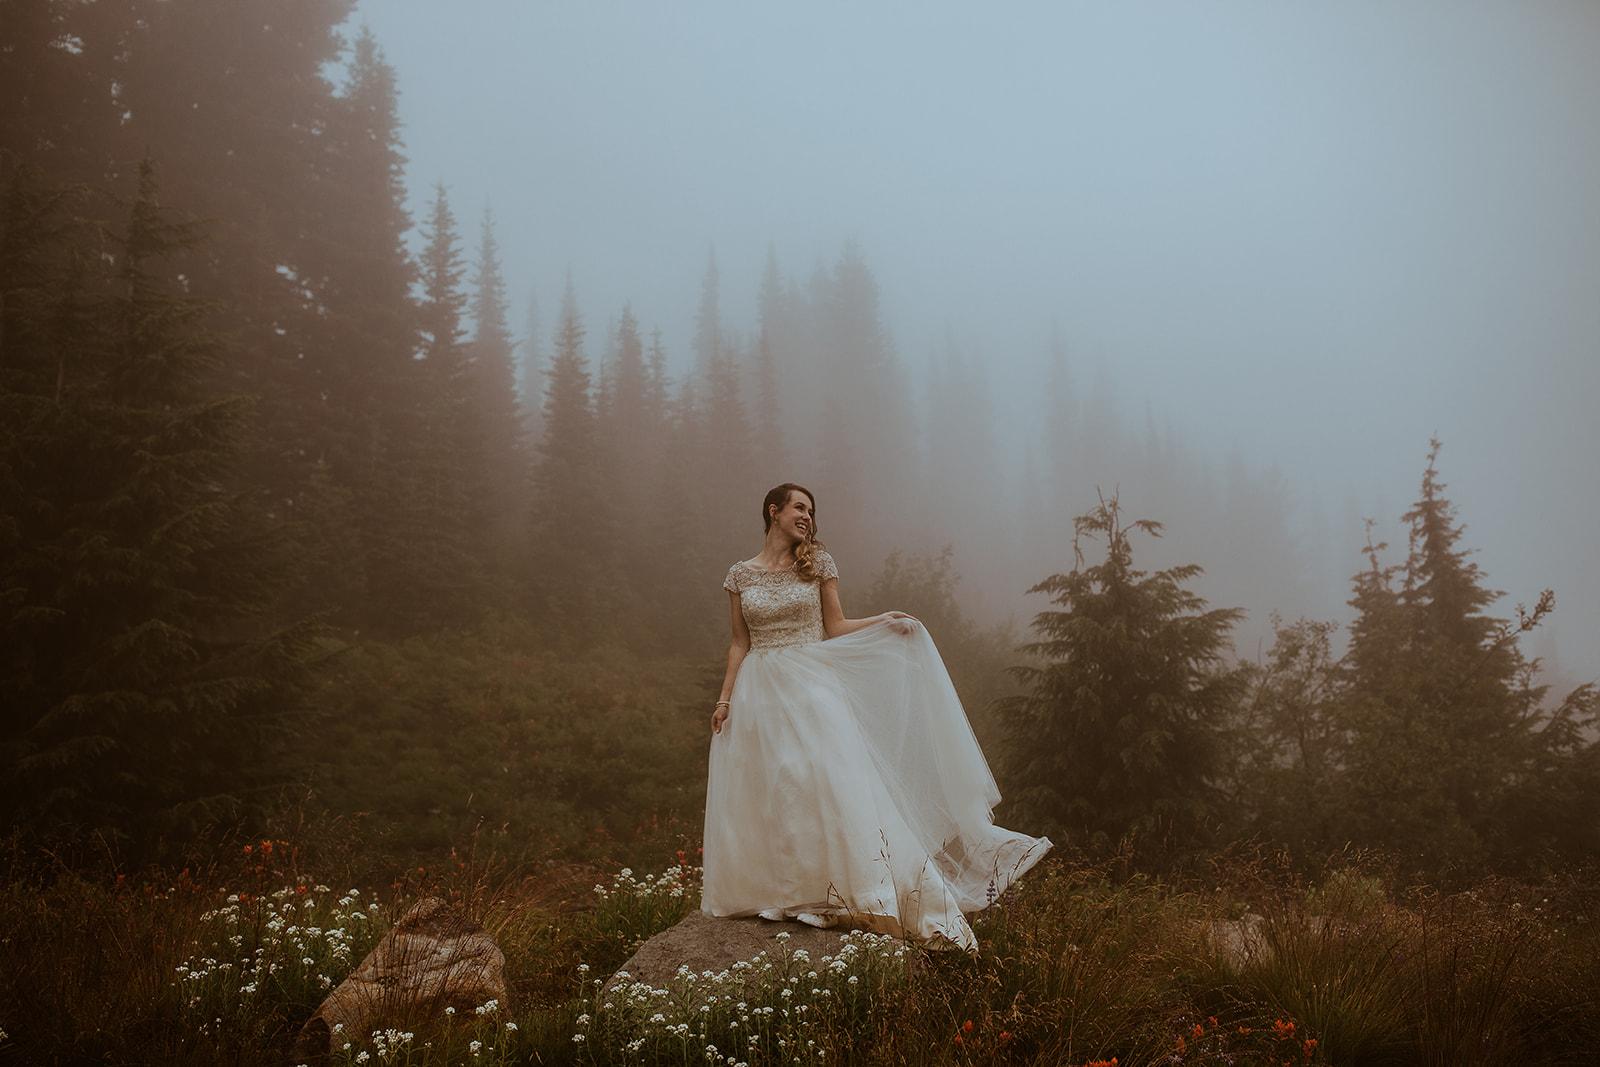 mount-rainier-cabin-elopement-megan-gallagher-photography_(417_of_568).jpg